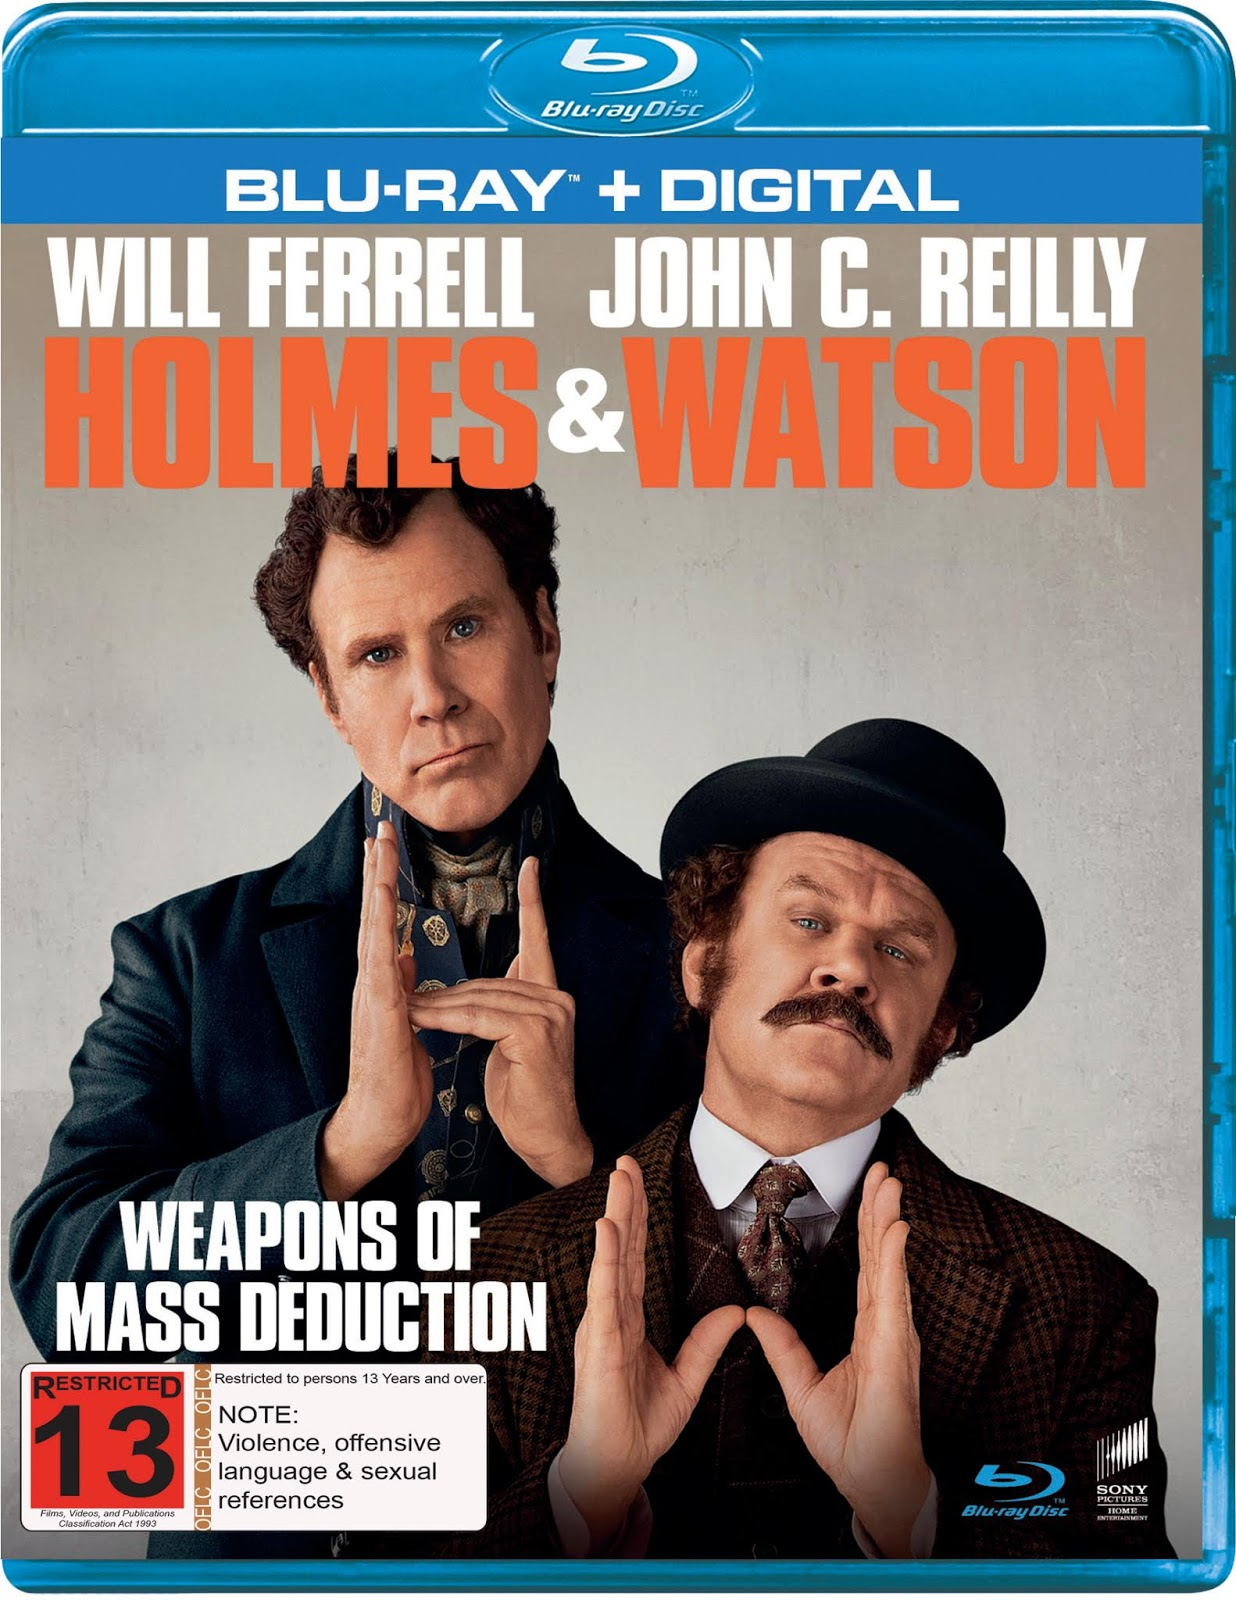 Holmes watson blu ray review